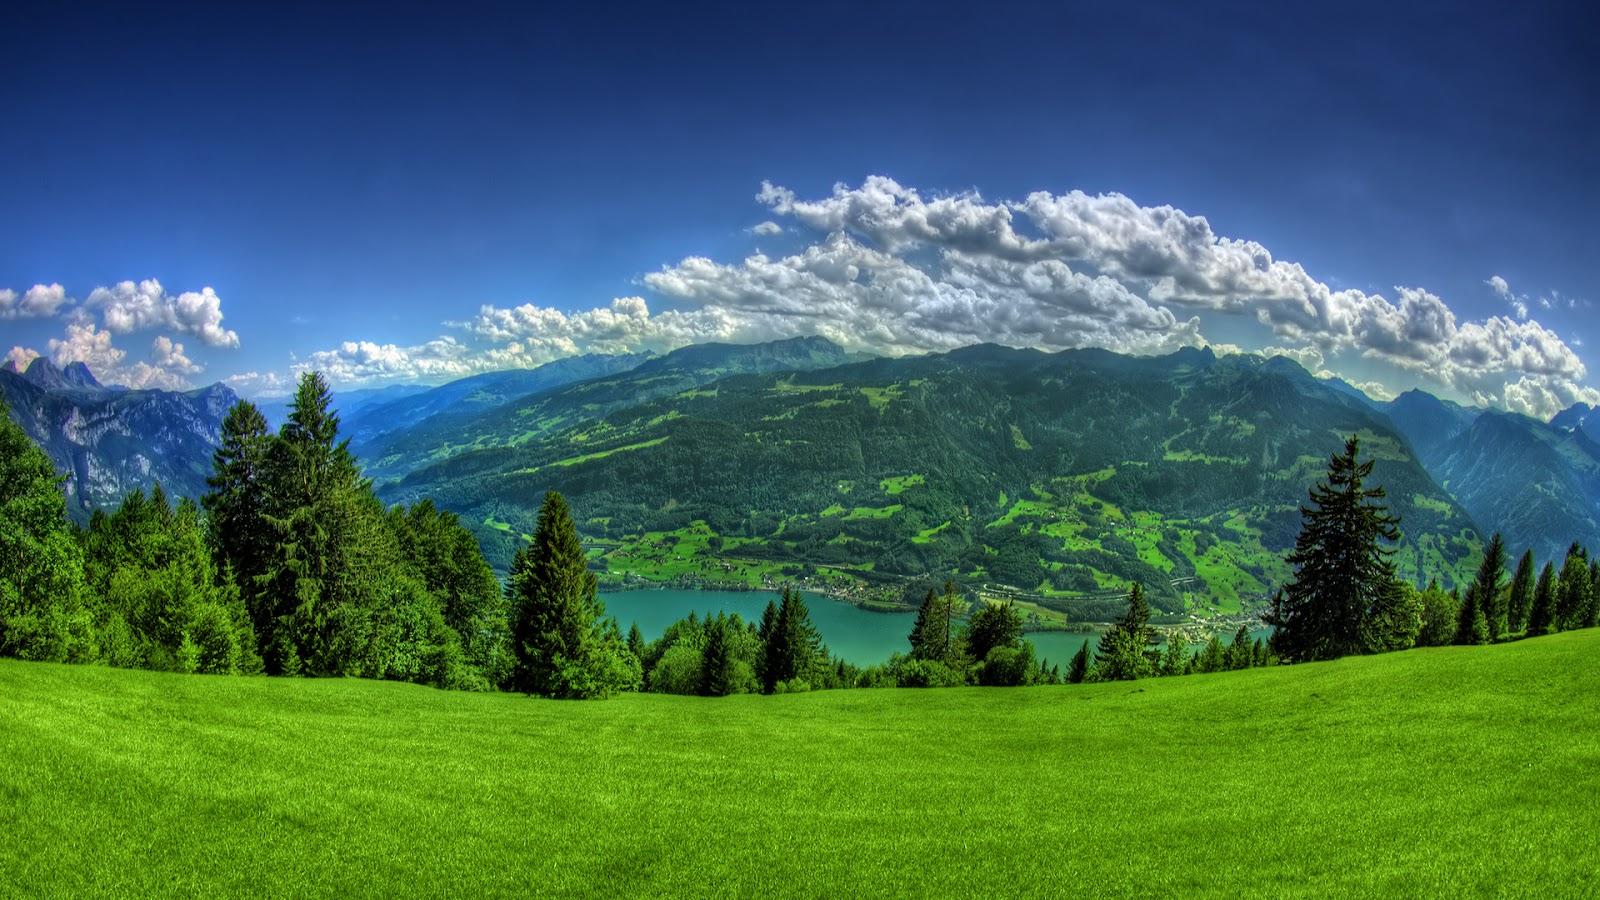 mountain full HD nature background wallpaper for laptop widescreenjpg 1600x900